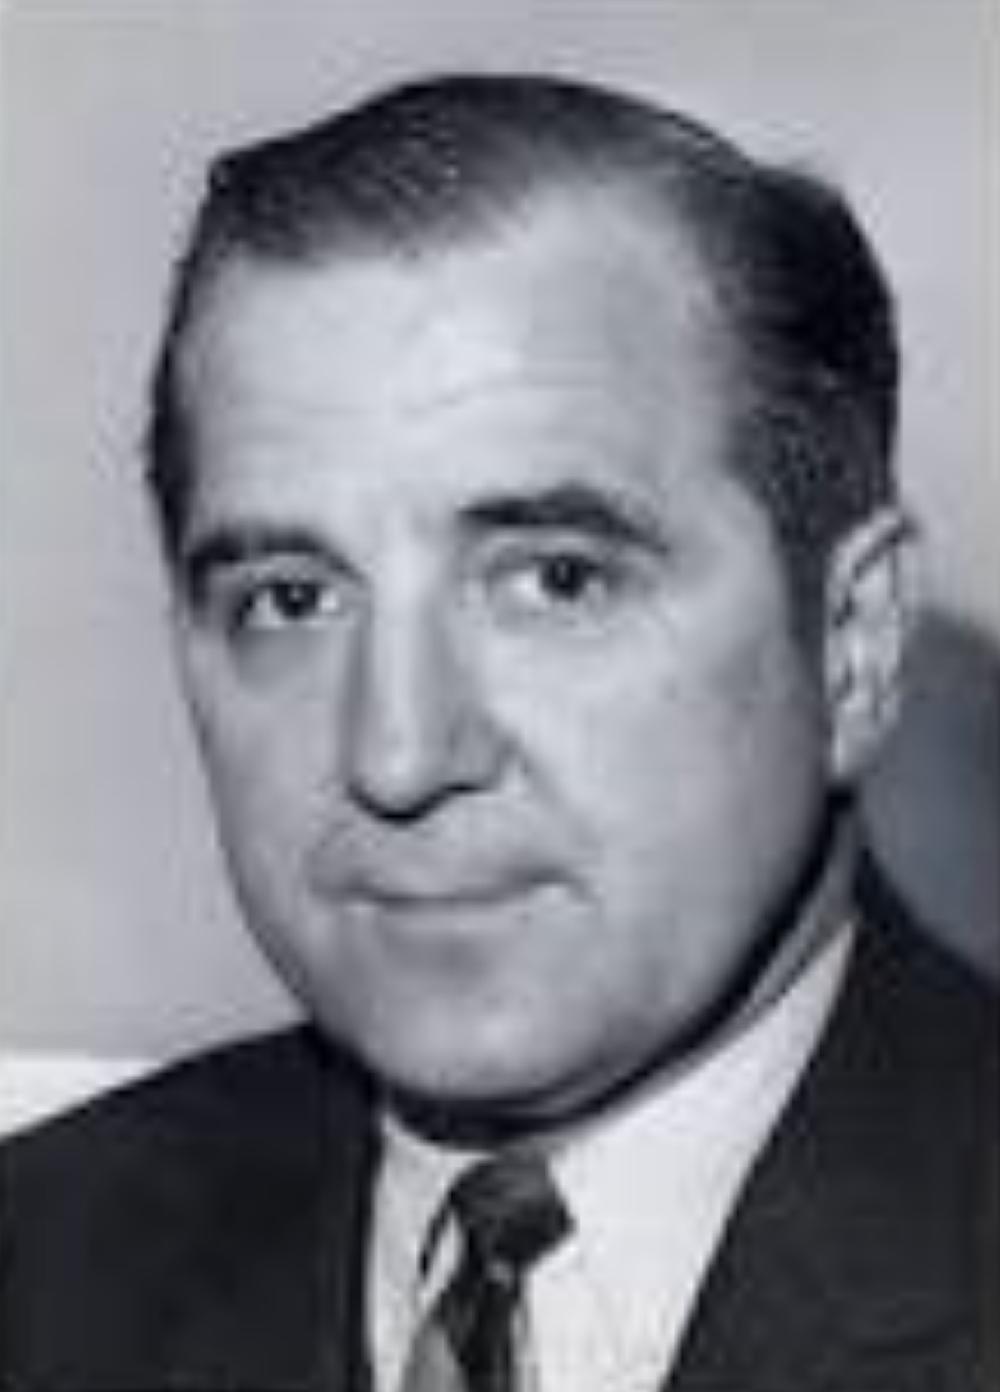 Mayor Roman Gribbs